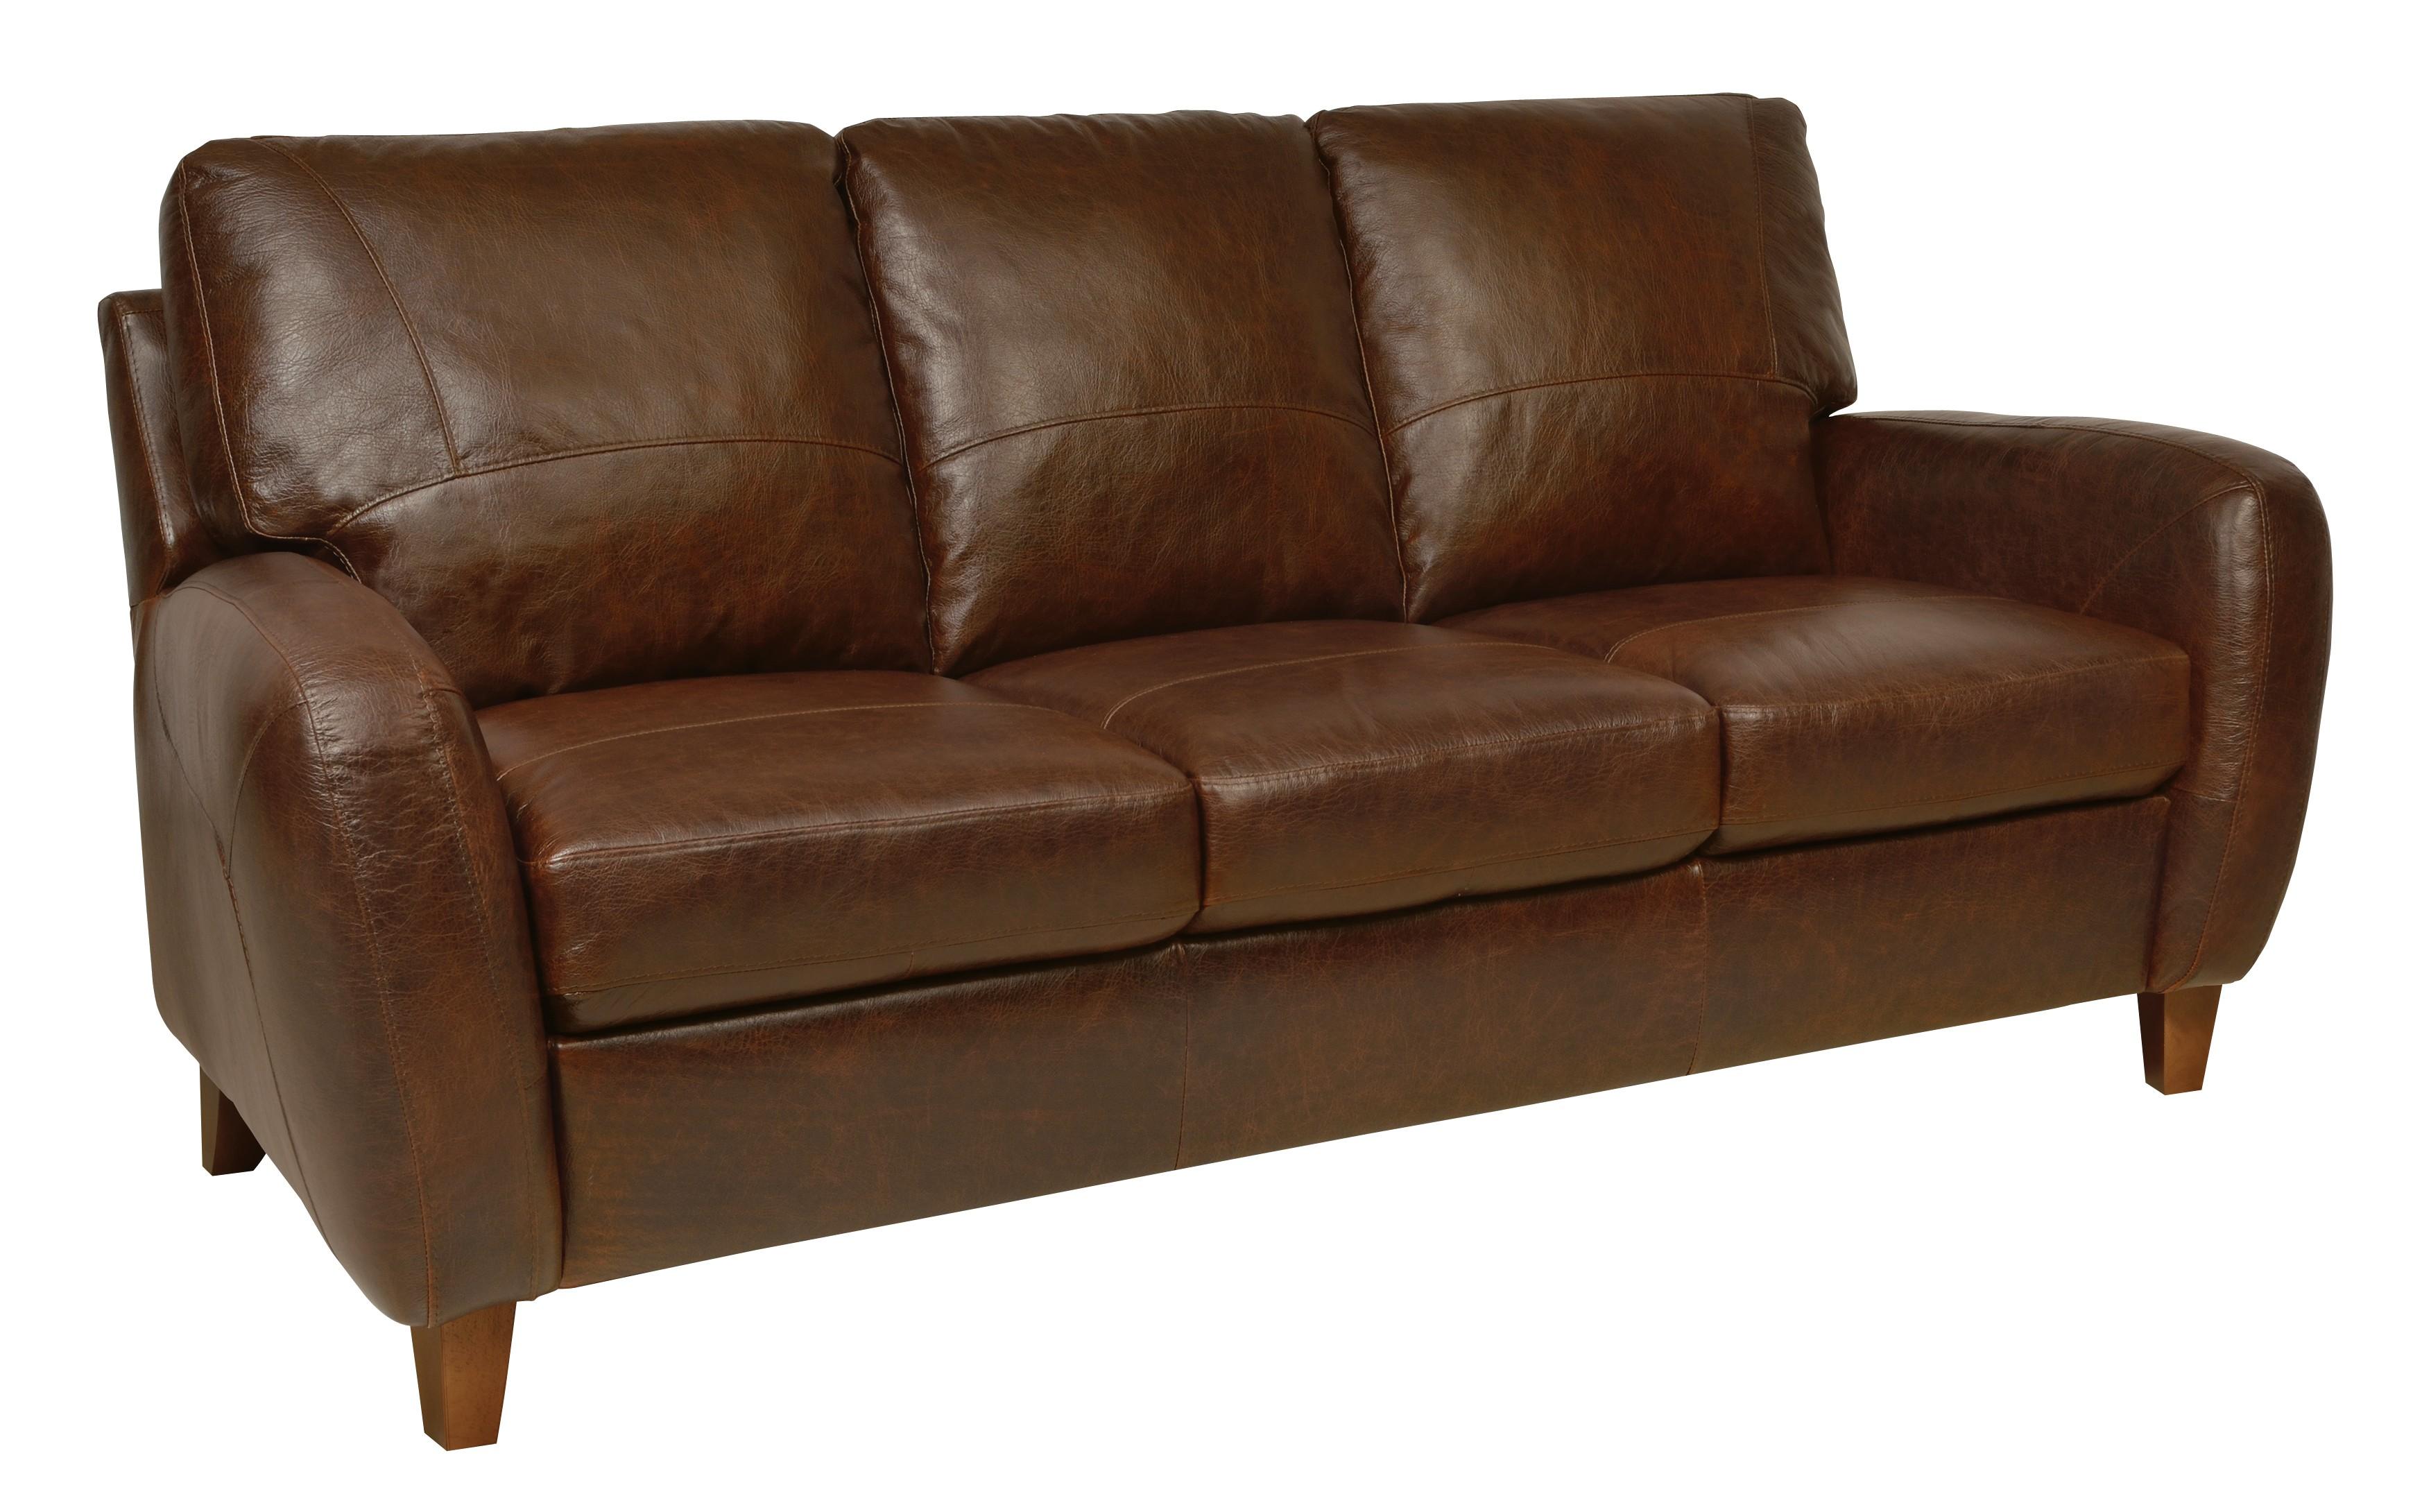 leather sofa washington dc cream gumtree belfast jennifer italian from luke coleman